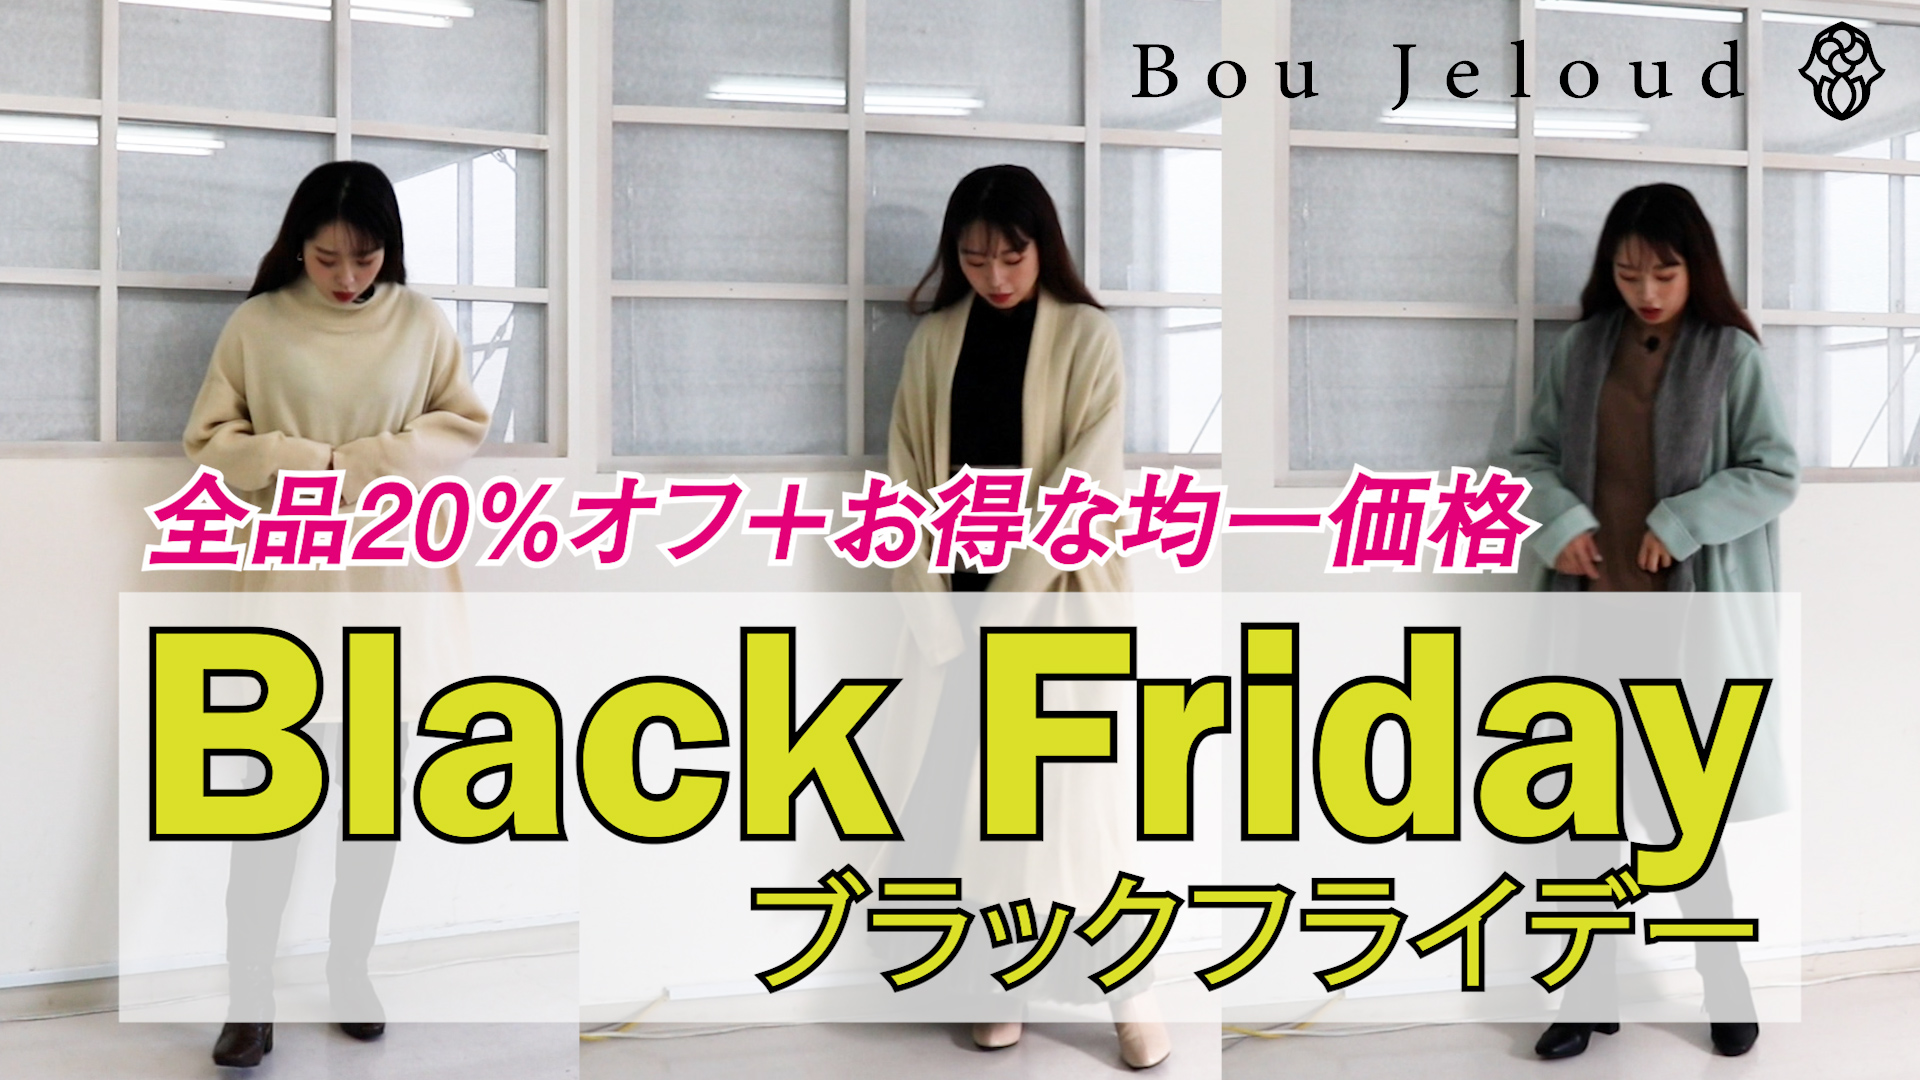 【BLACK FRIDAY】お得にショッピング!秋冬🍁❄️全身コーデ✨